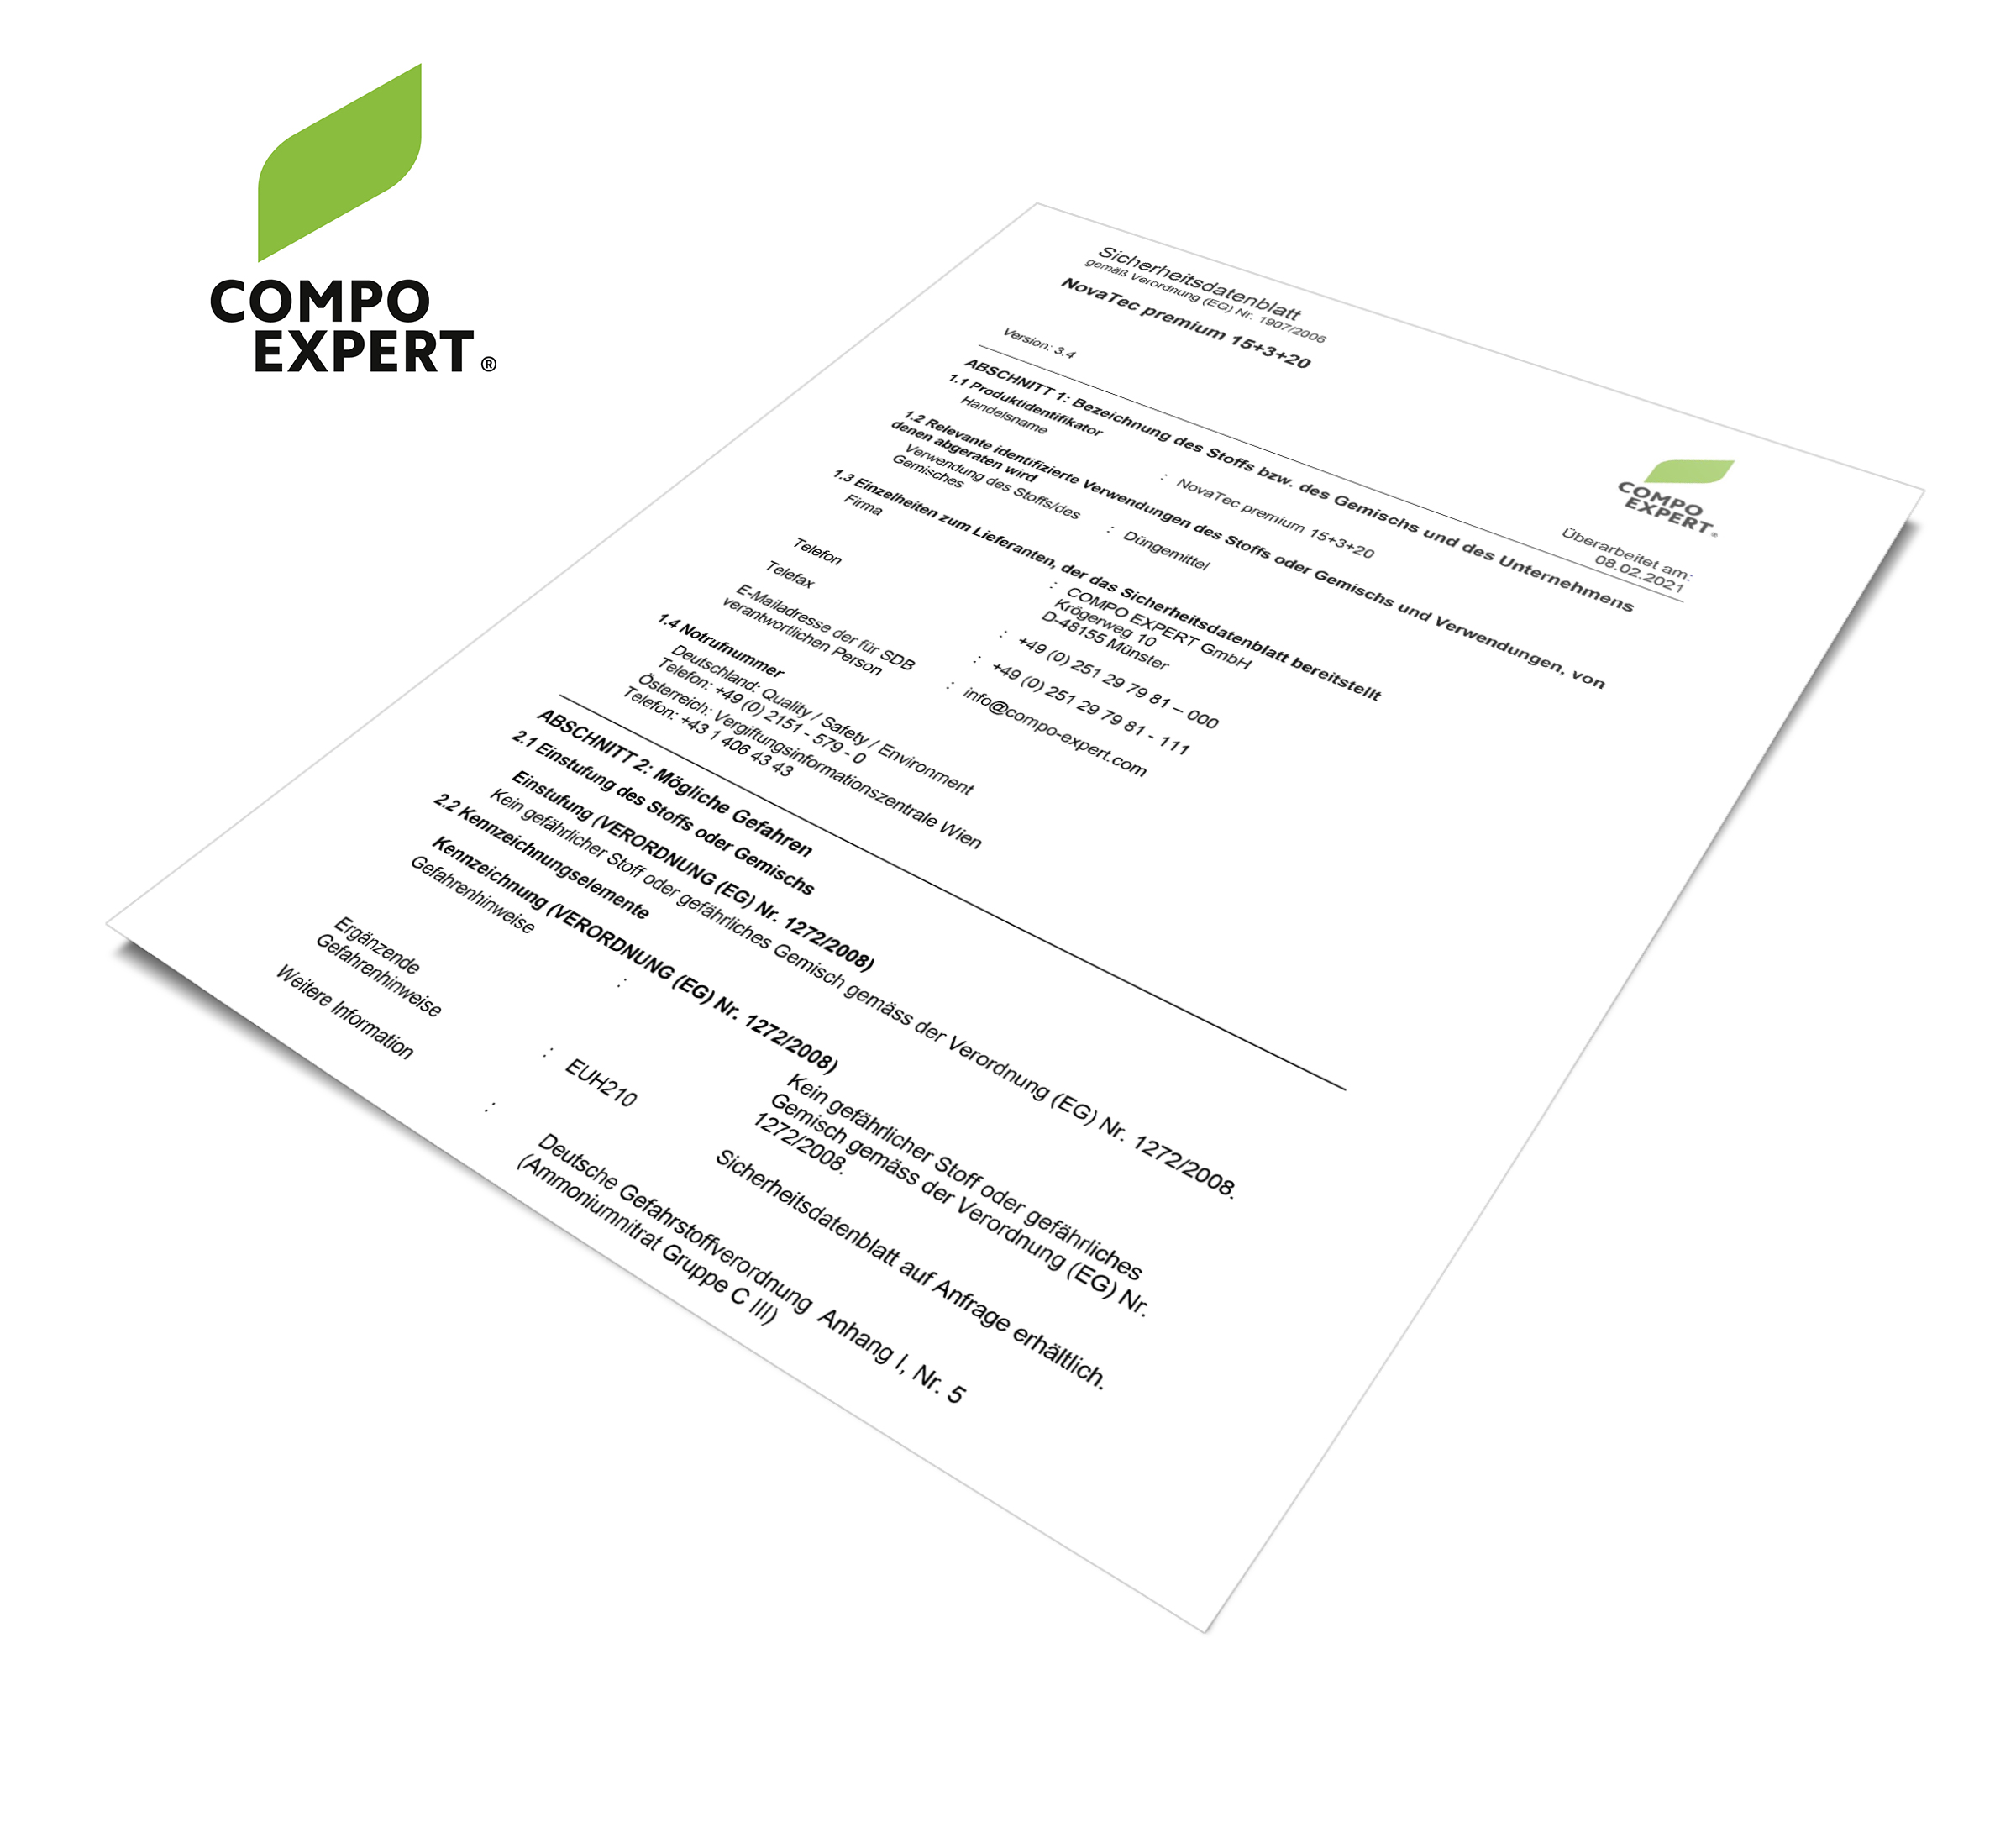 Compo_Expert_Sicherheitsblatt_2_2021